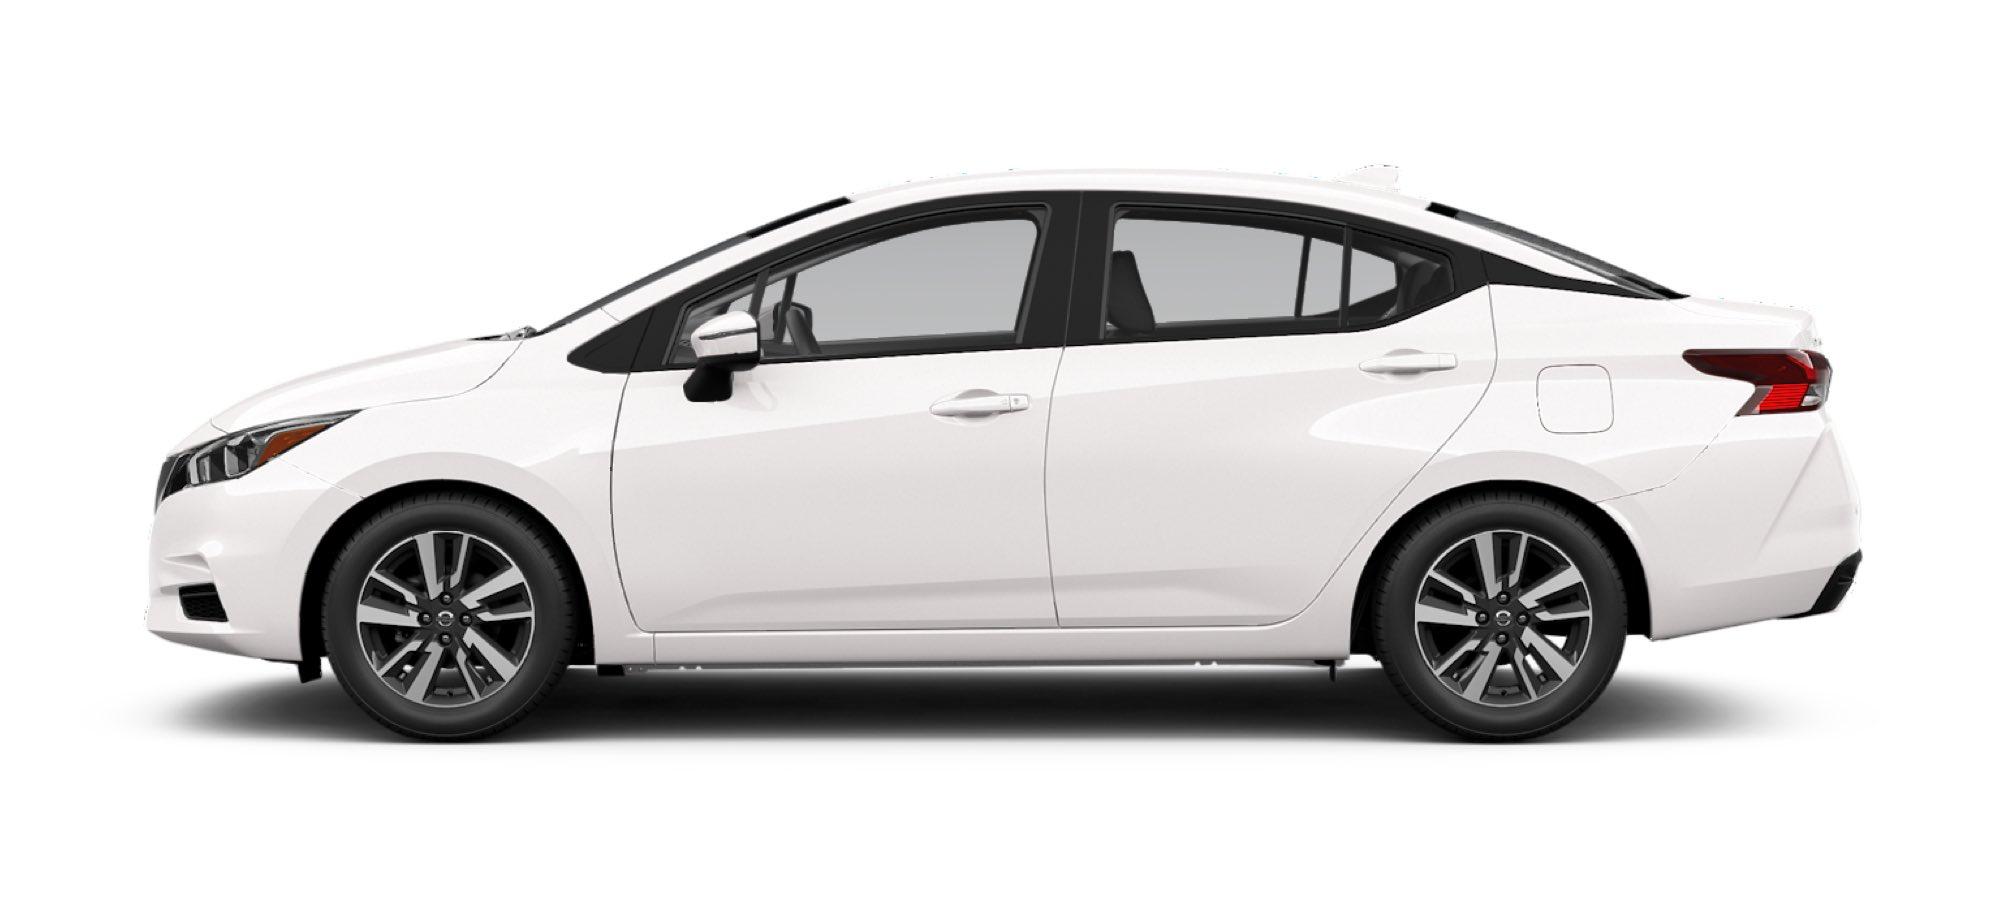 2021 Nissan Versa in Aspen White TriCoat